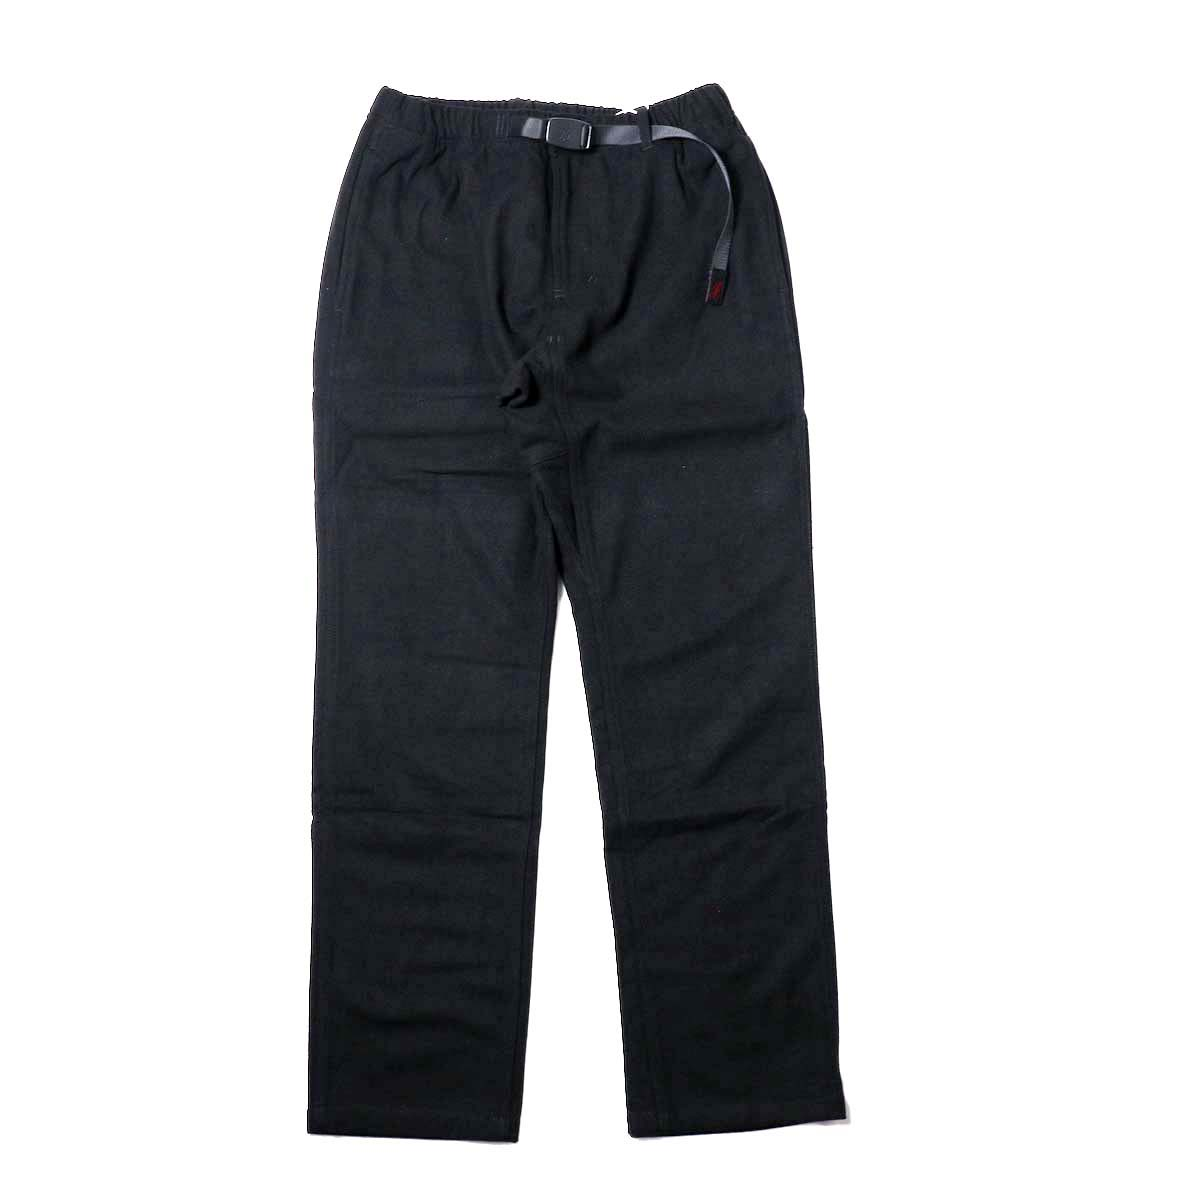 GRAMICCI / WOOL BLEND ST-PANTS (Black)正面